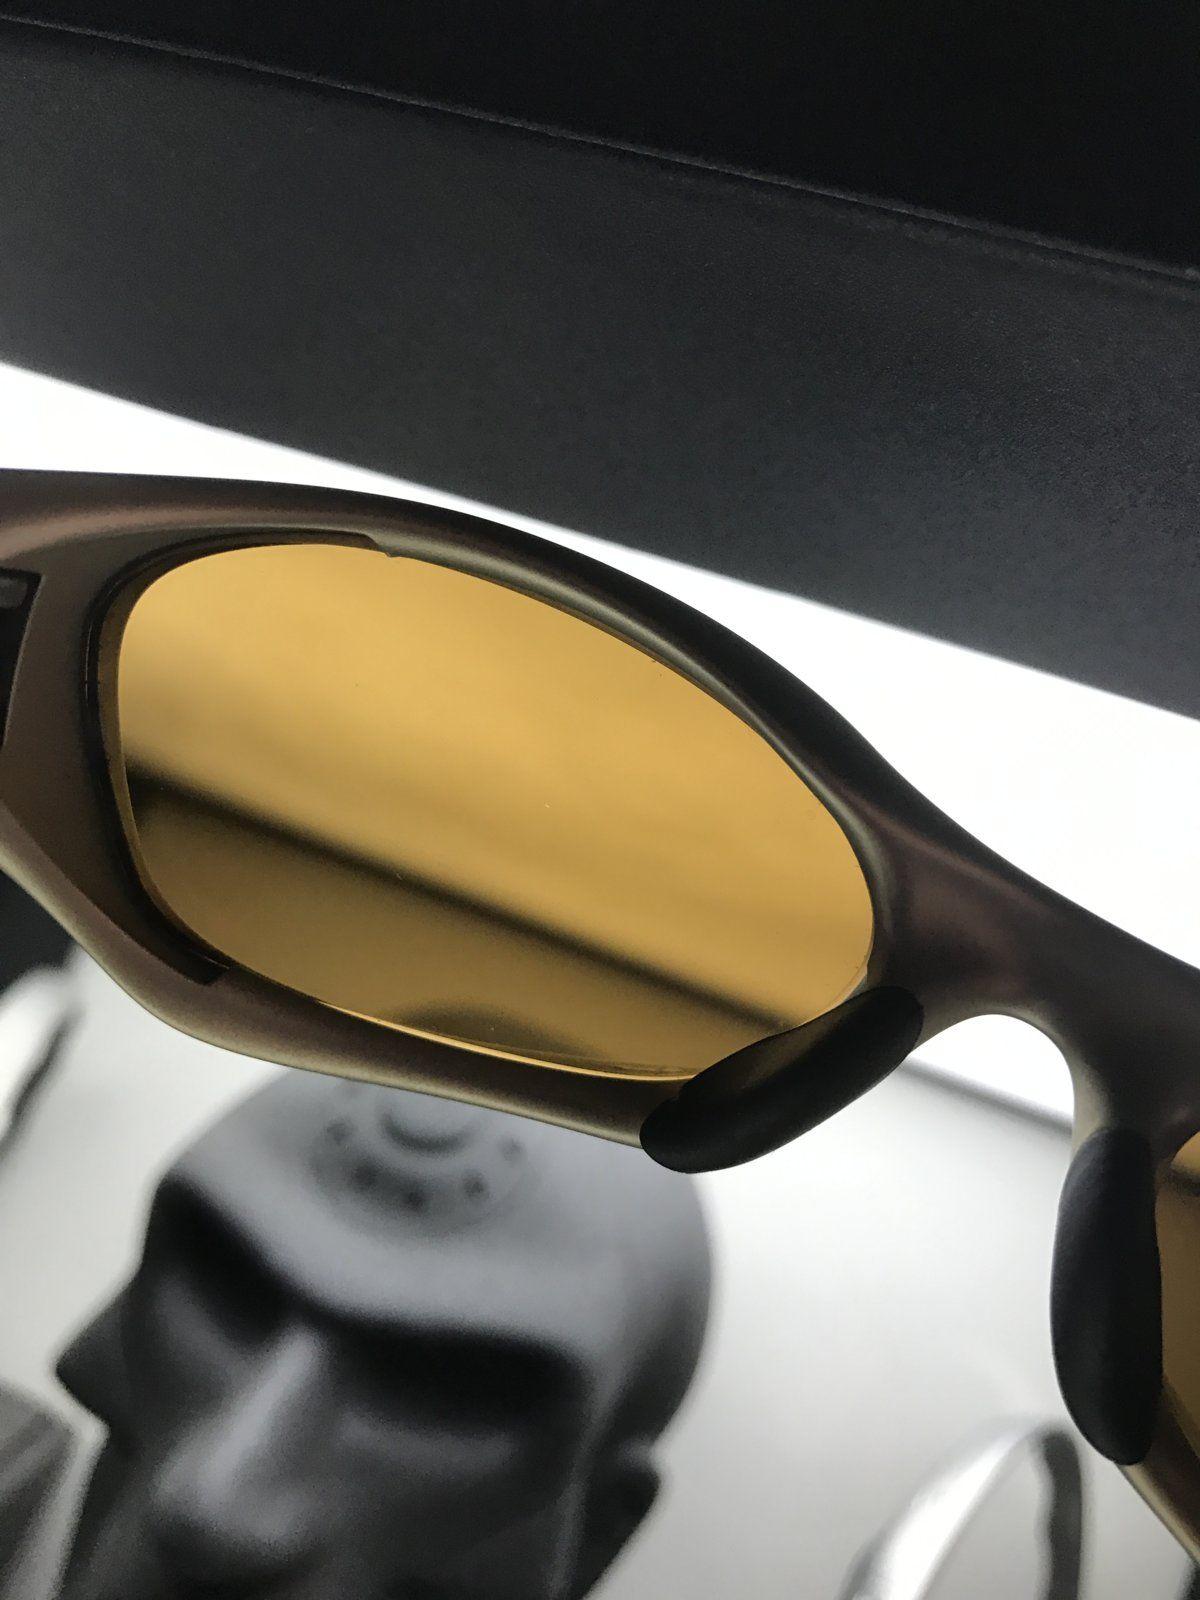 Valve FMJ Platinum - FMJ+ w/ gold iridium - $110 - IMG_6355.JPG